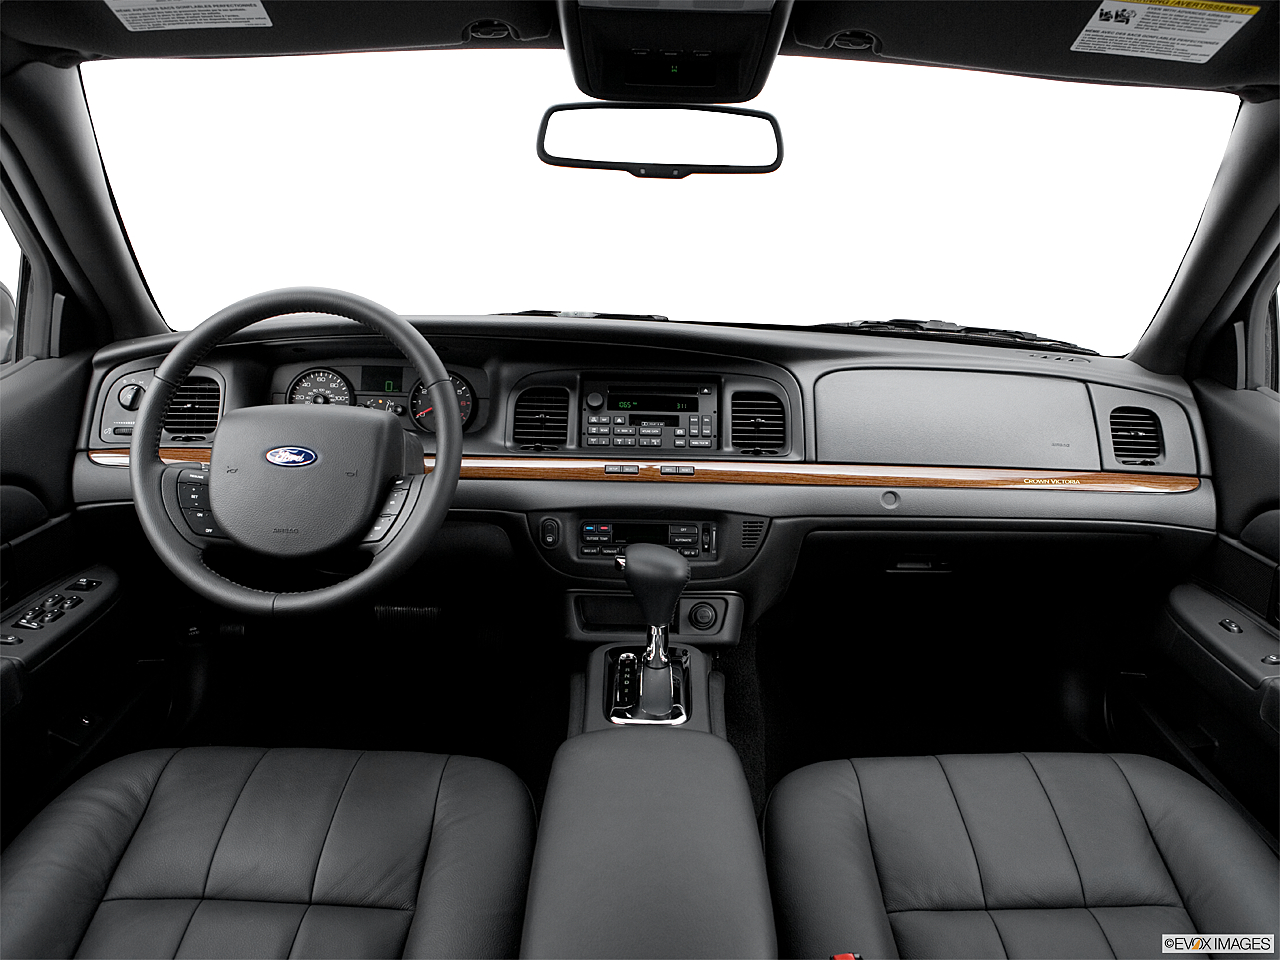 Ford Crown Victoria Lx Sport Centered Wide Dash Shot